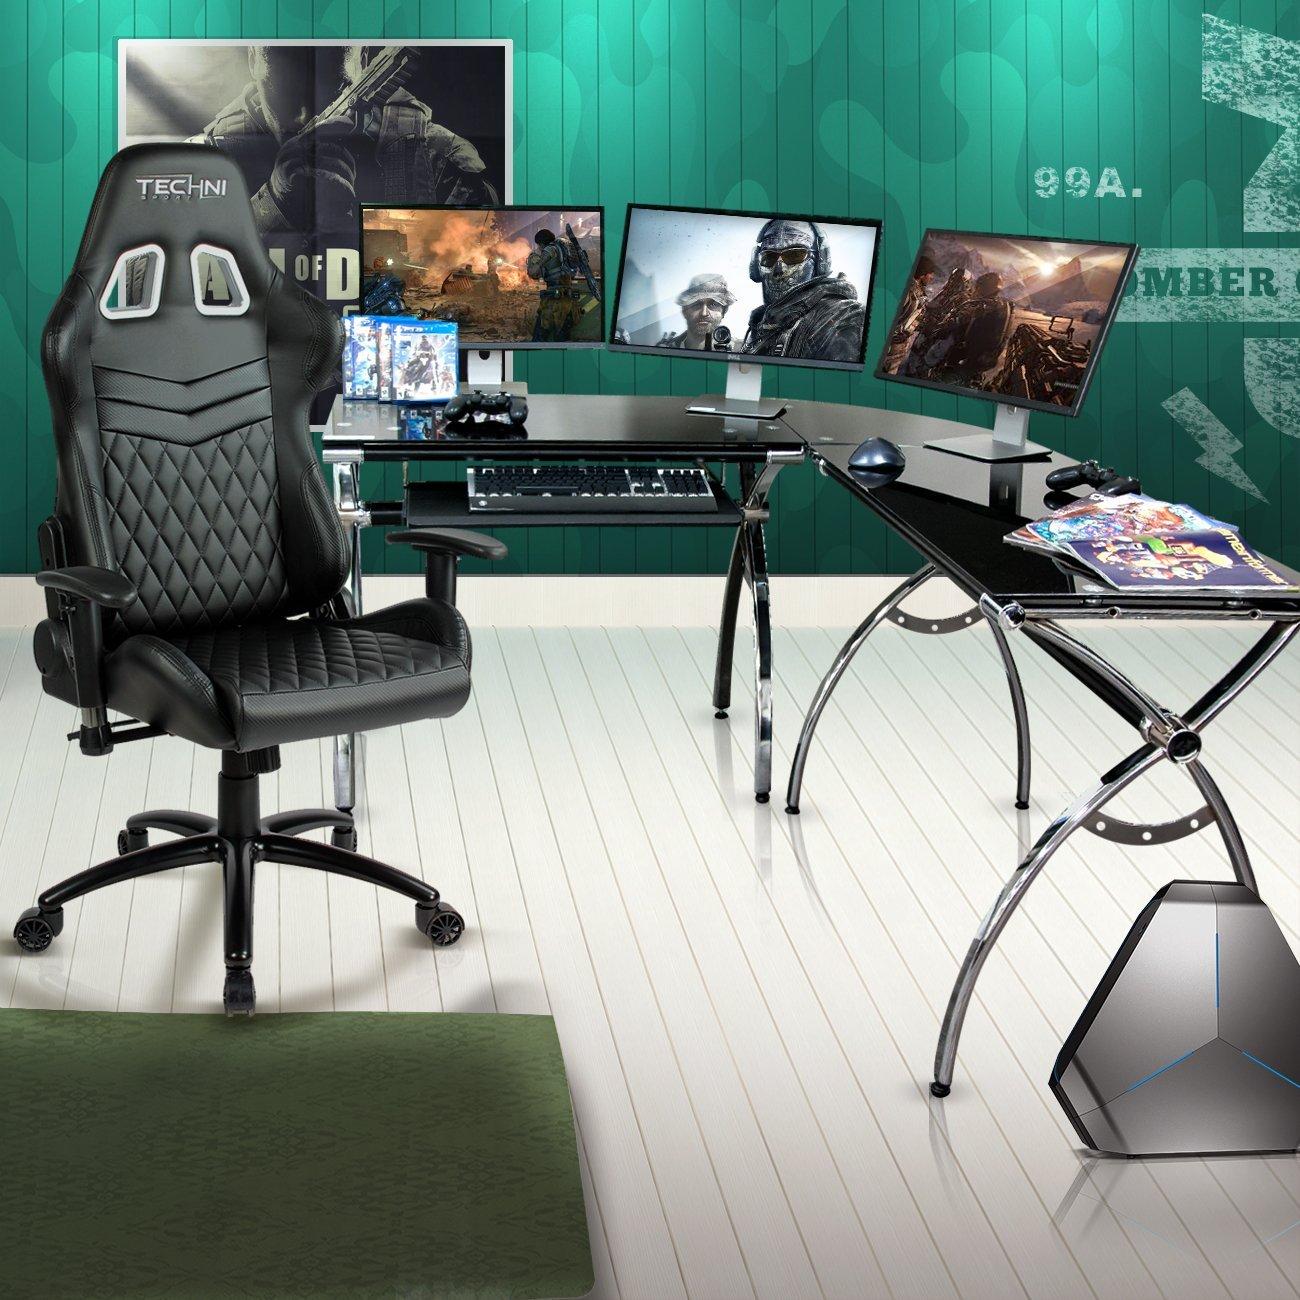 Techni Sport Gaming Desk Luxor